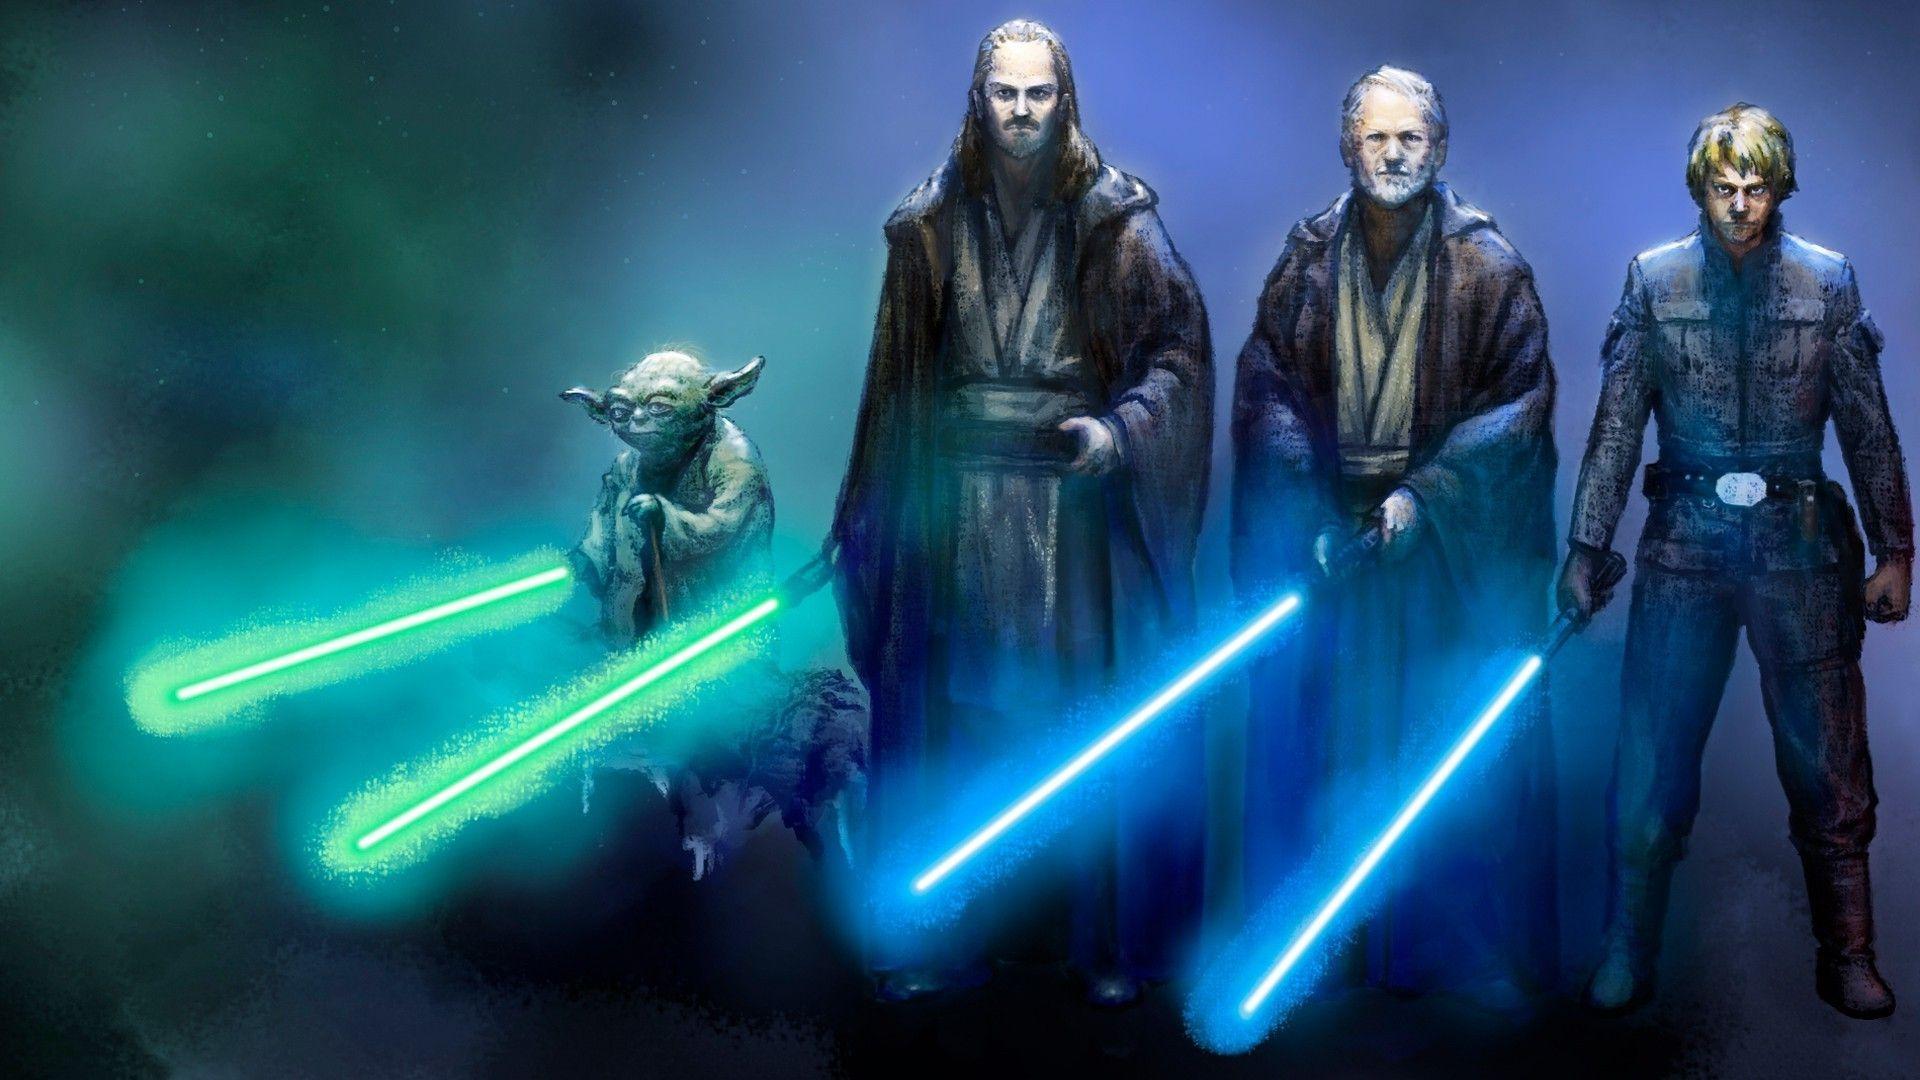 Star Wars Jedi Wallpaper Star Wars Personagens Papel De Parede